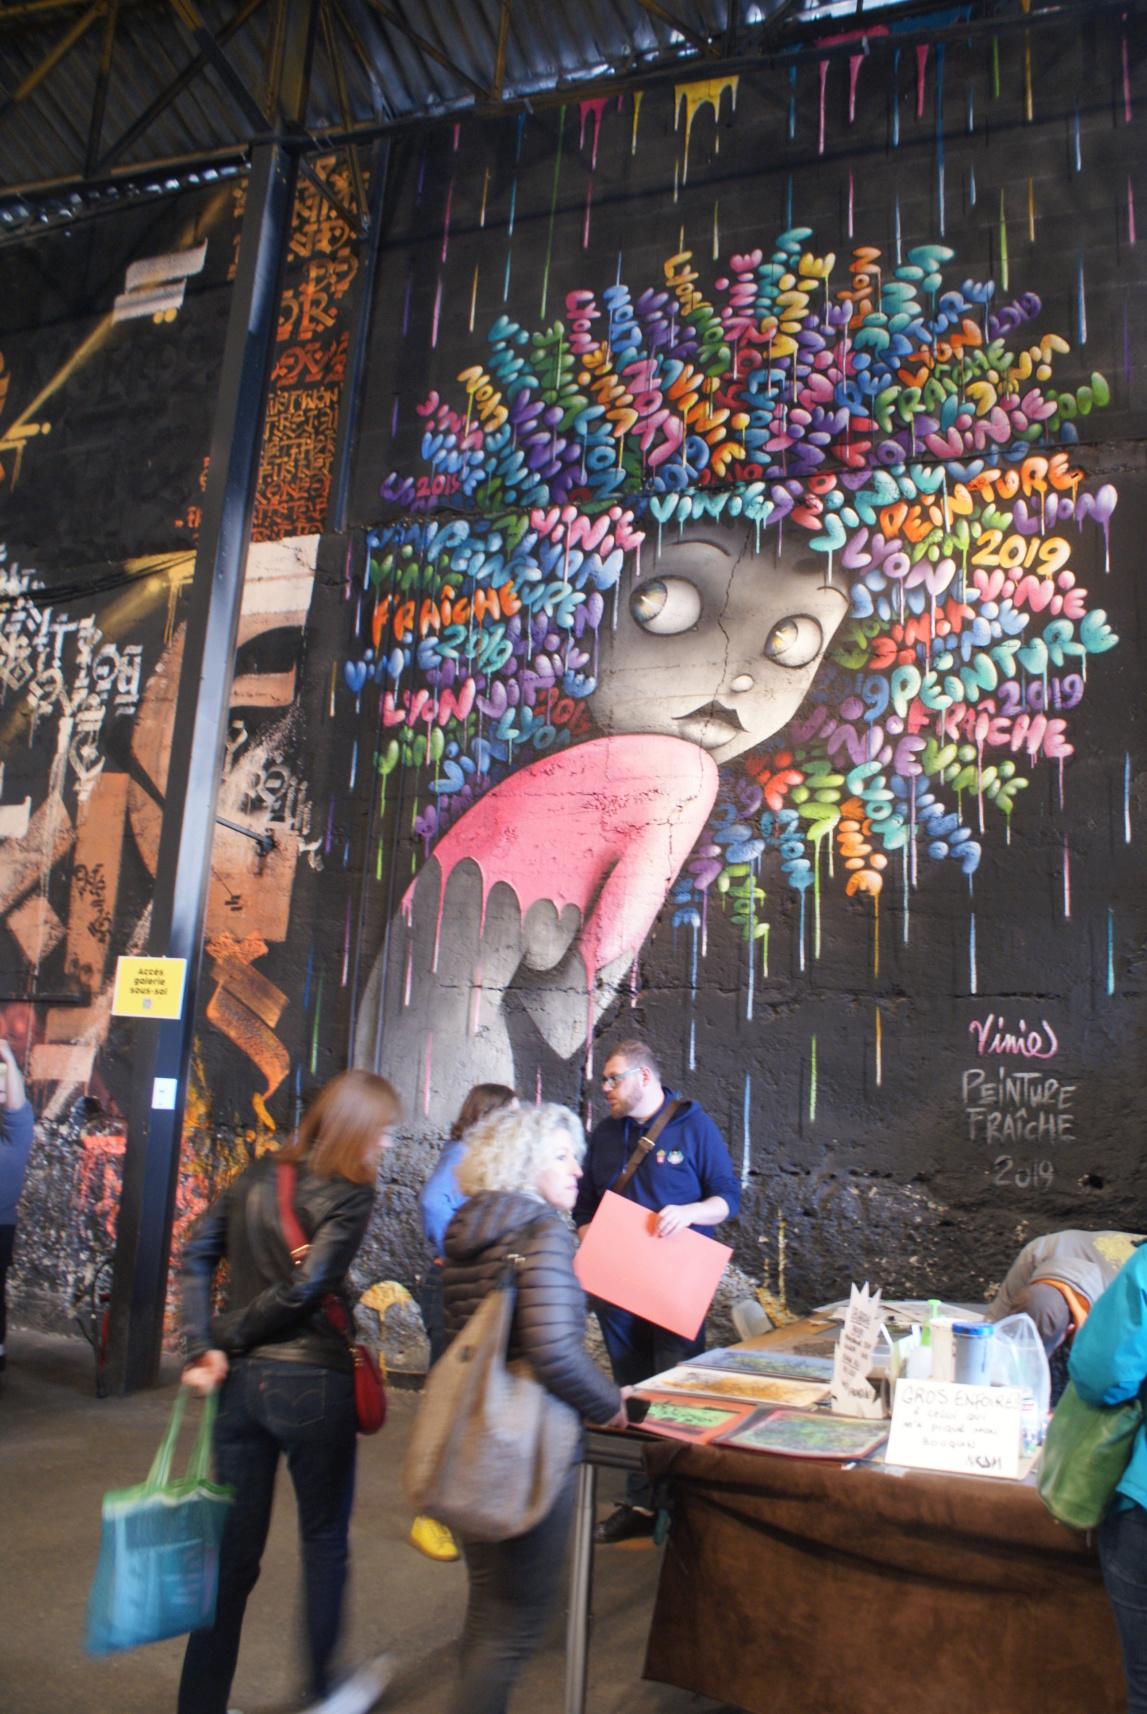 [street art-rue et manifs] Peinture fraîche, à Lyon 2019 Dsc05110